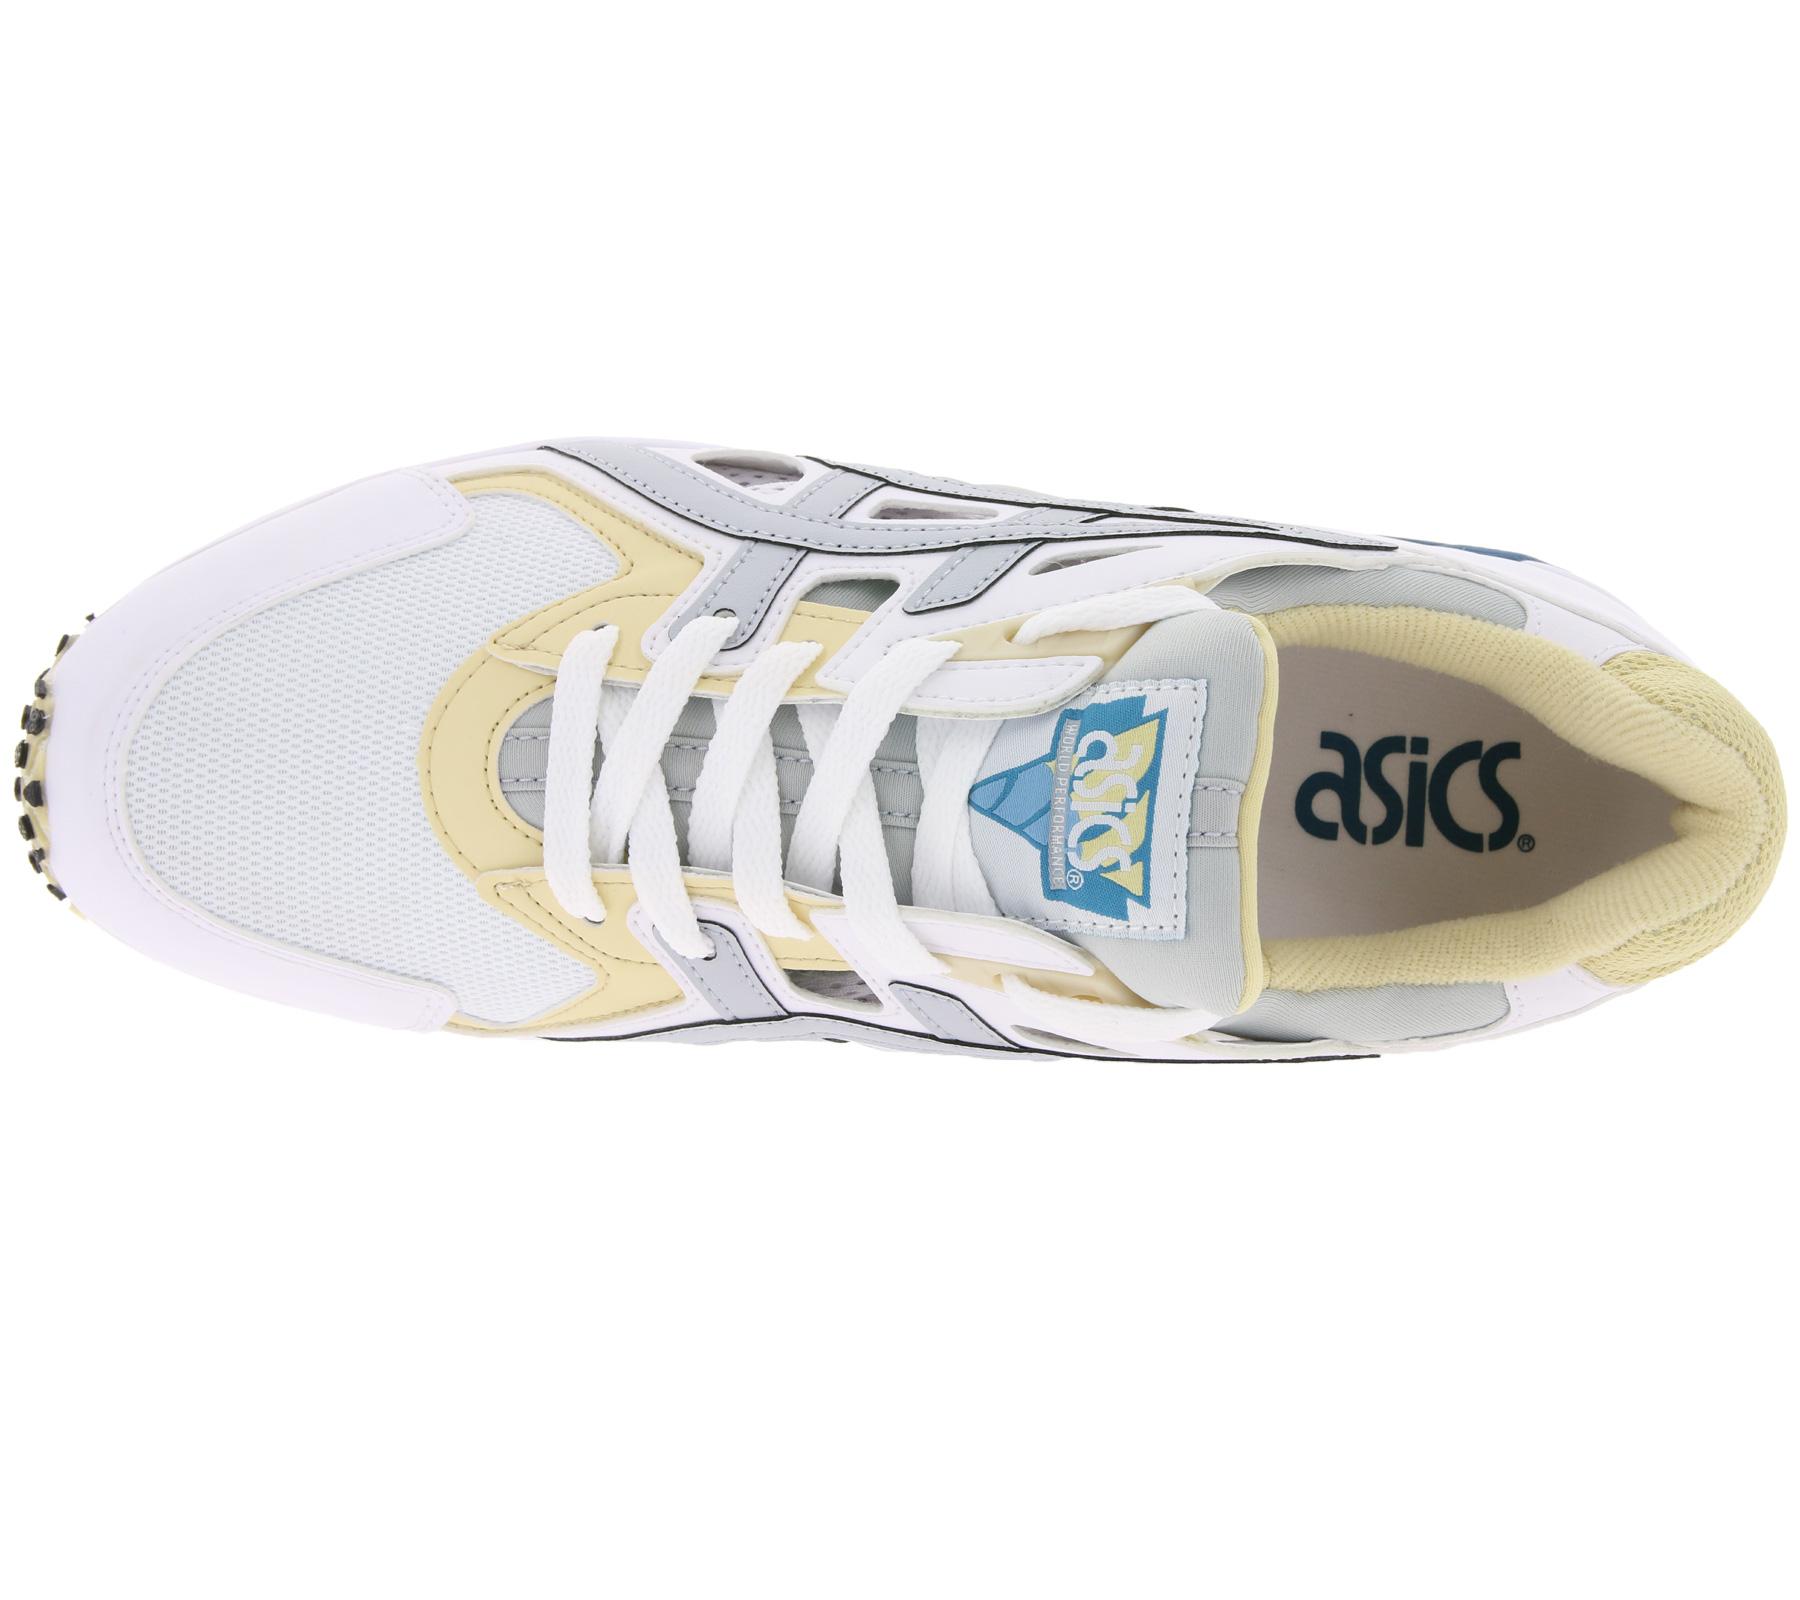 d59644216ebf36 asics Sneaker